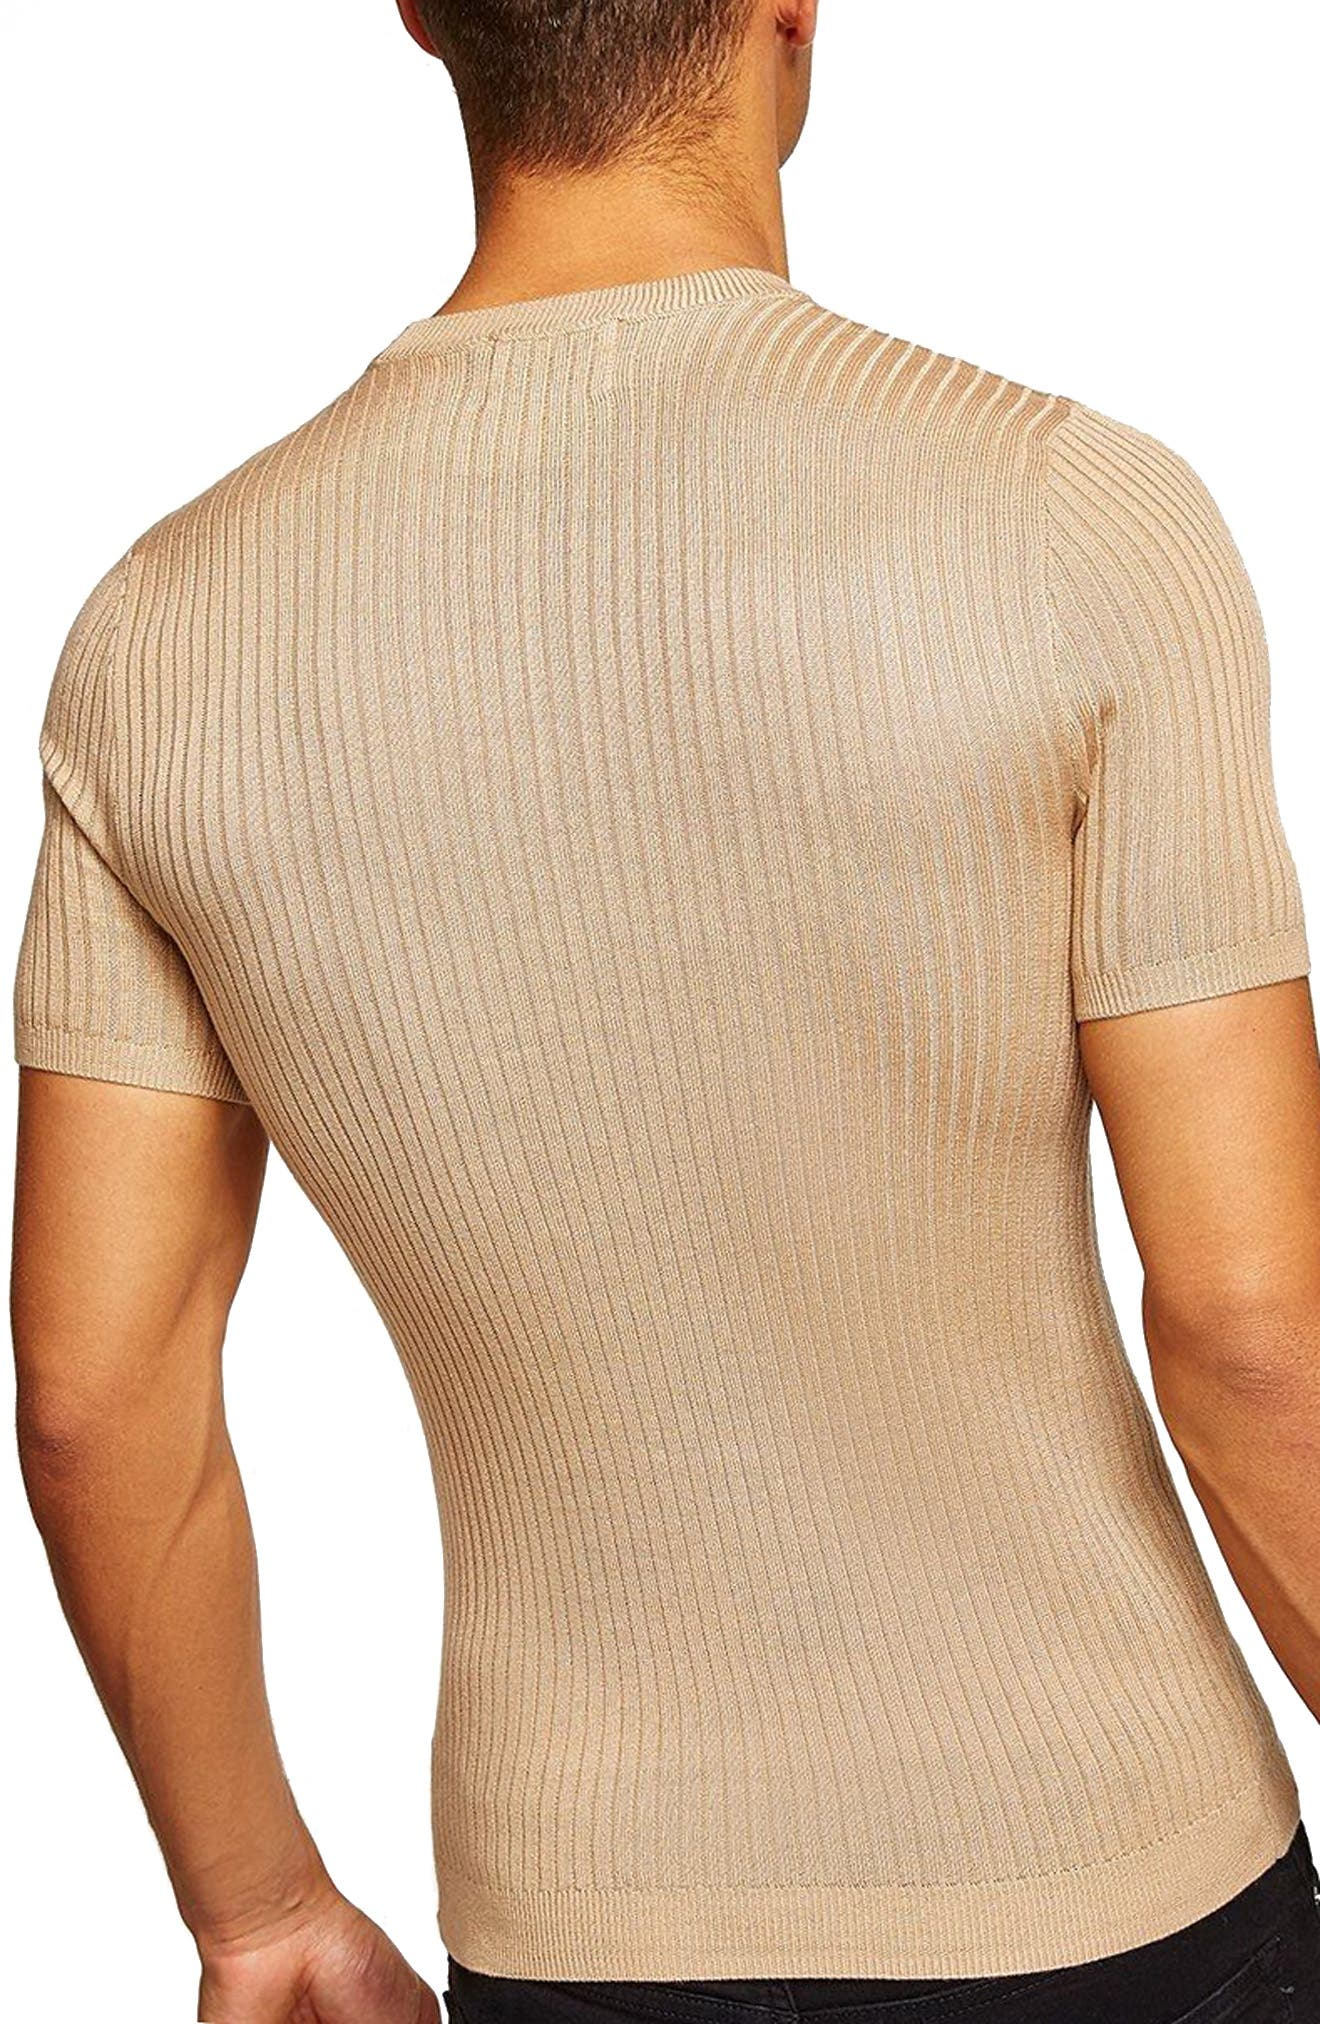 Short Sleeve Muscle Fit Shirt,                             Alternate thumbnail 2, color,                             250